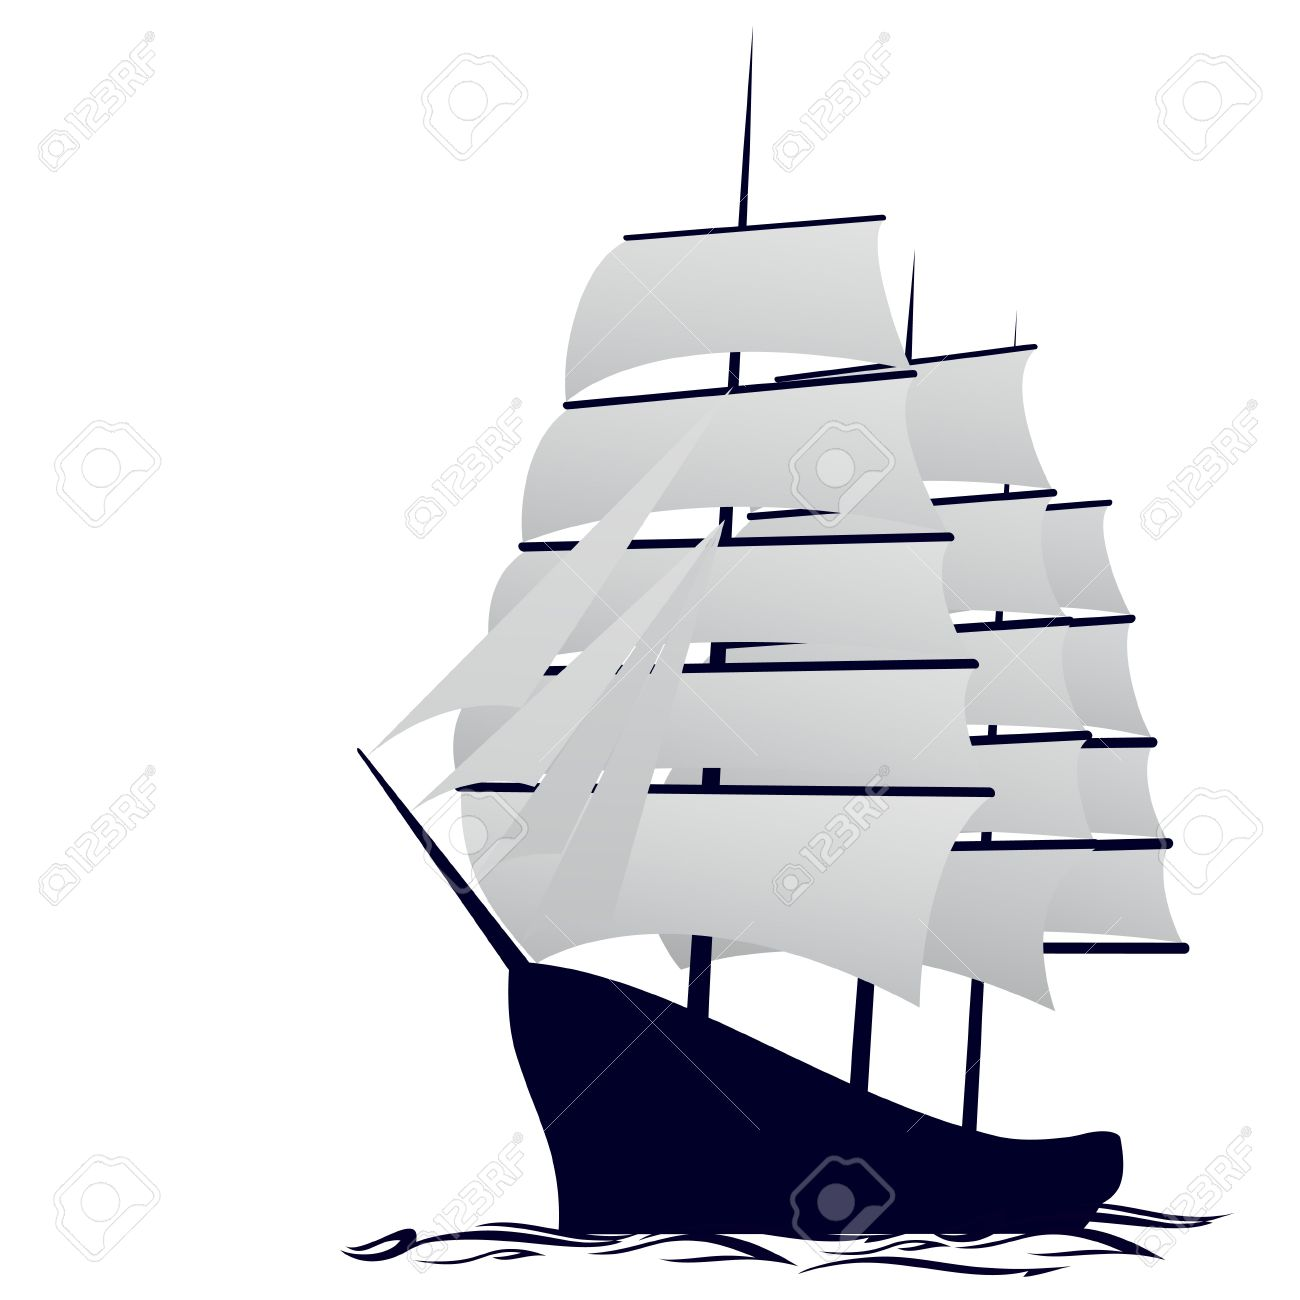 Antiguo barco de vela. Ilustración Sobre Fondo Blanco.